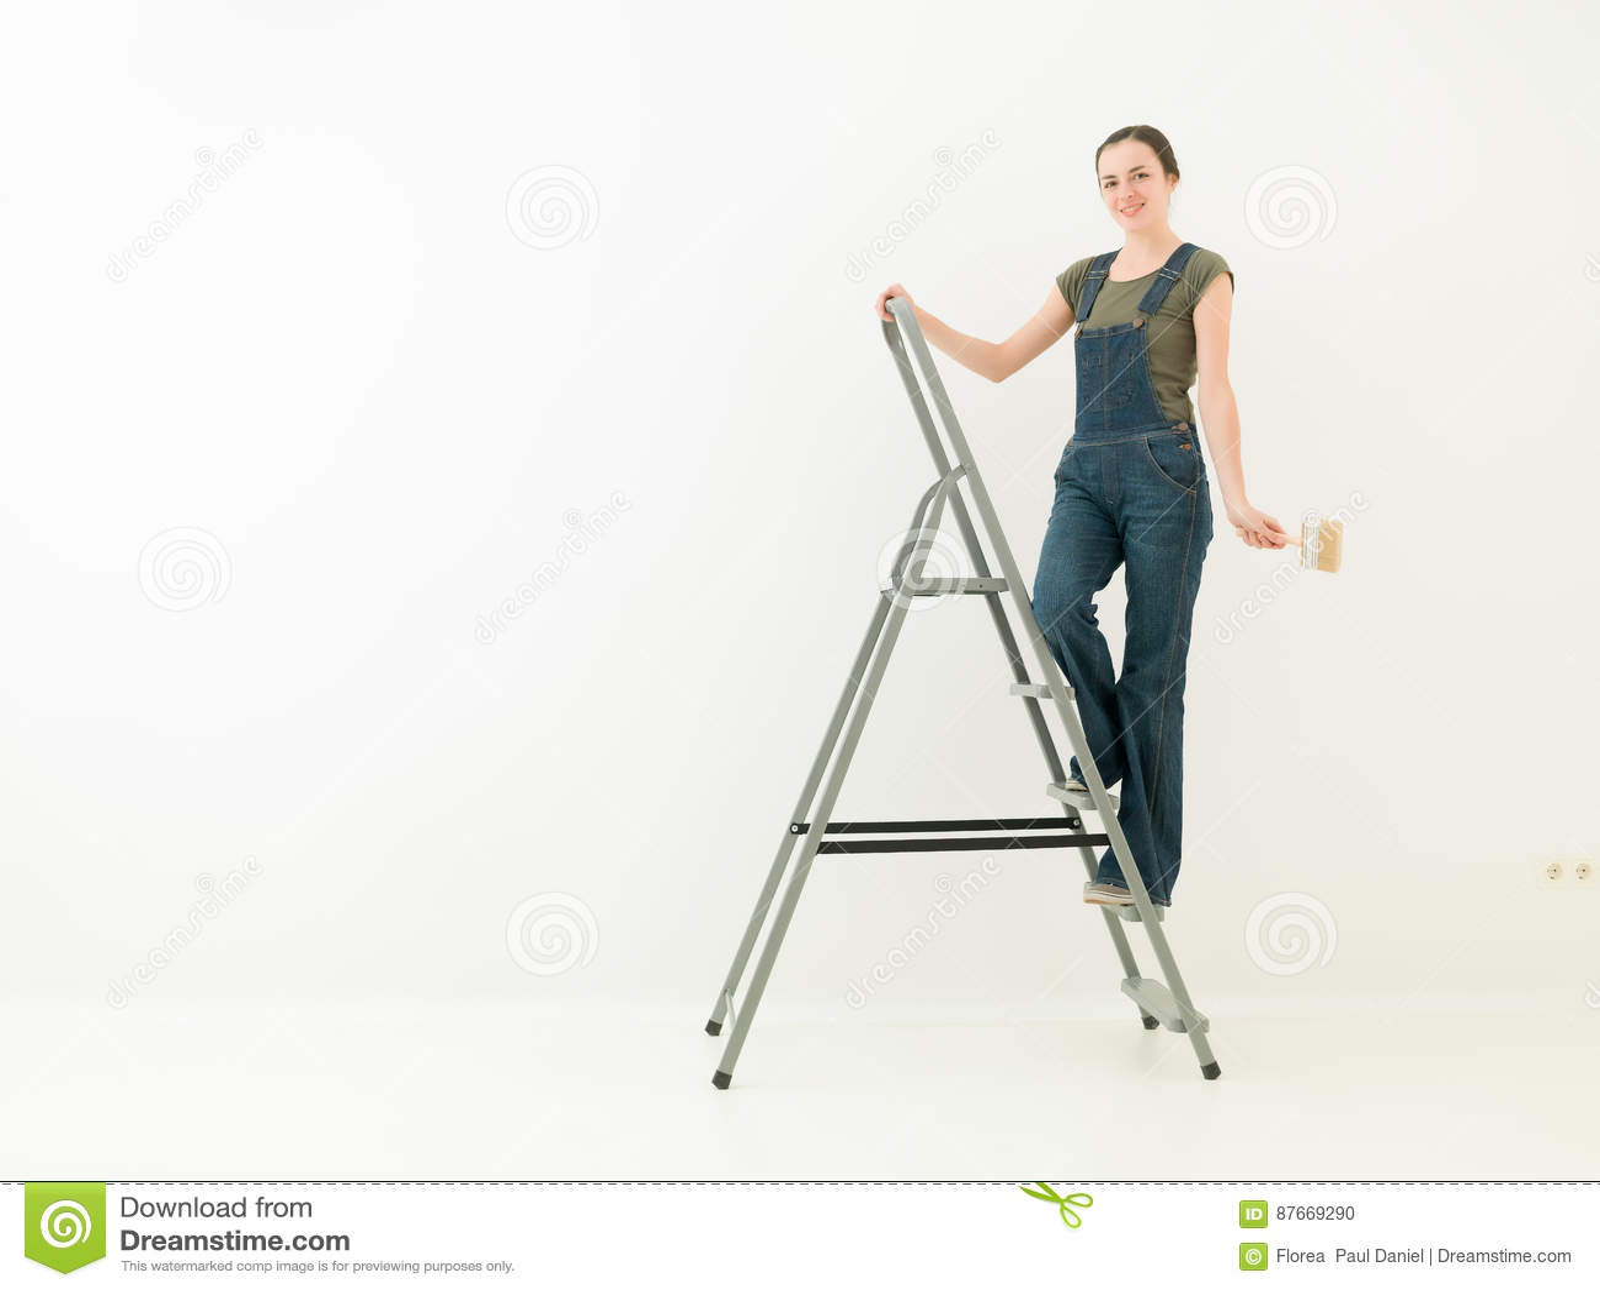 Thuiswerkmeisje op een ladder